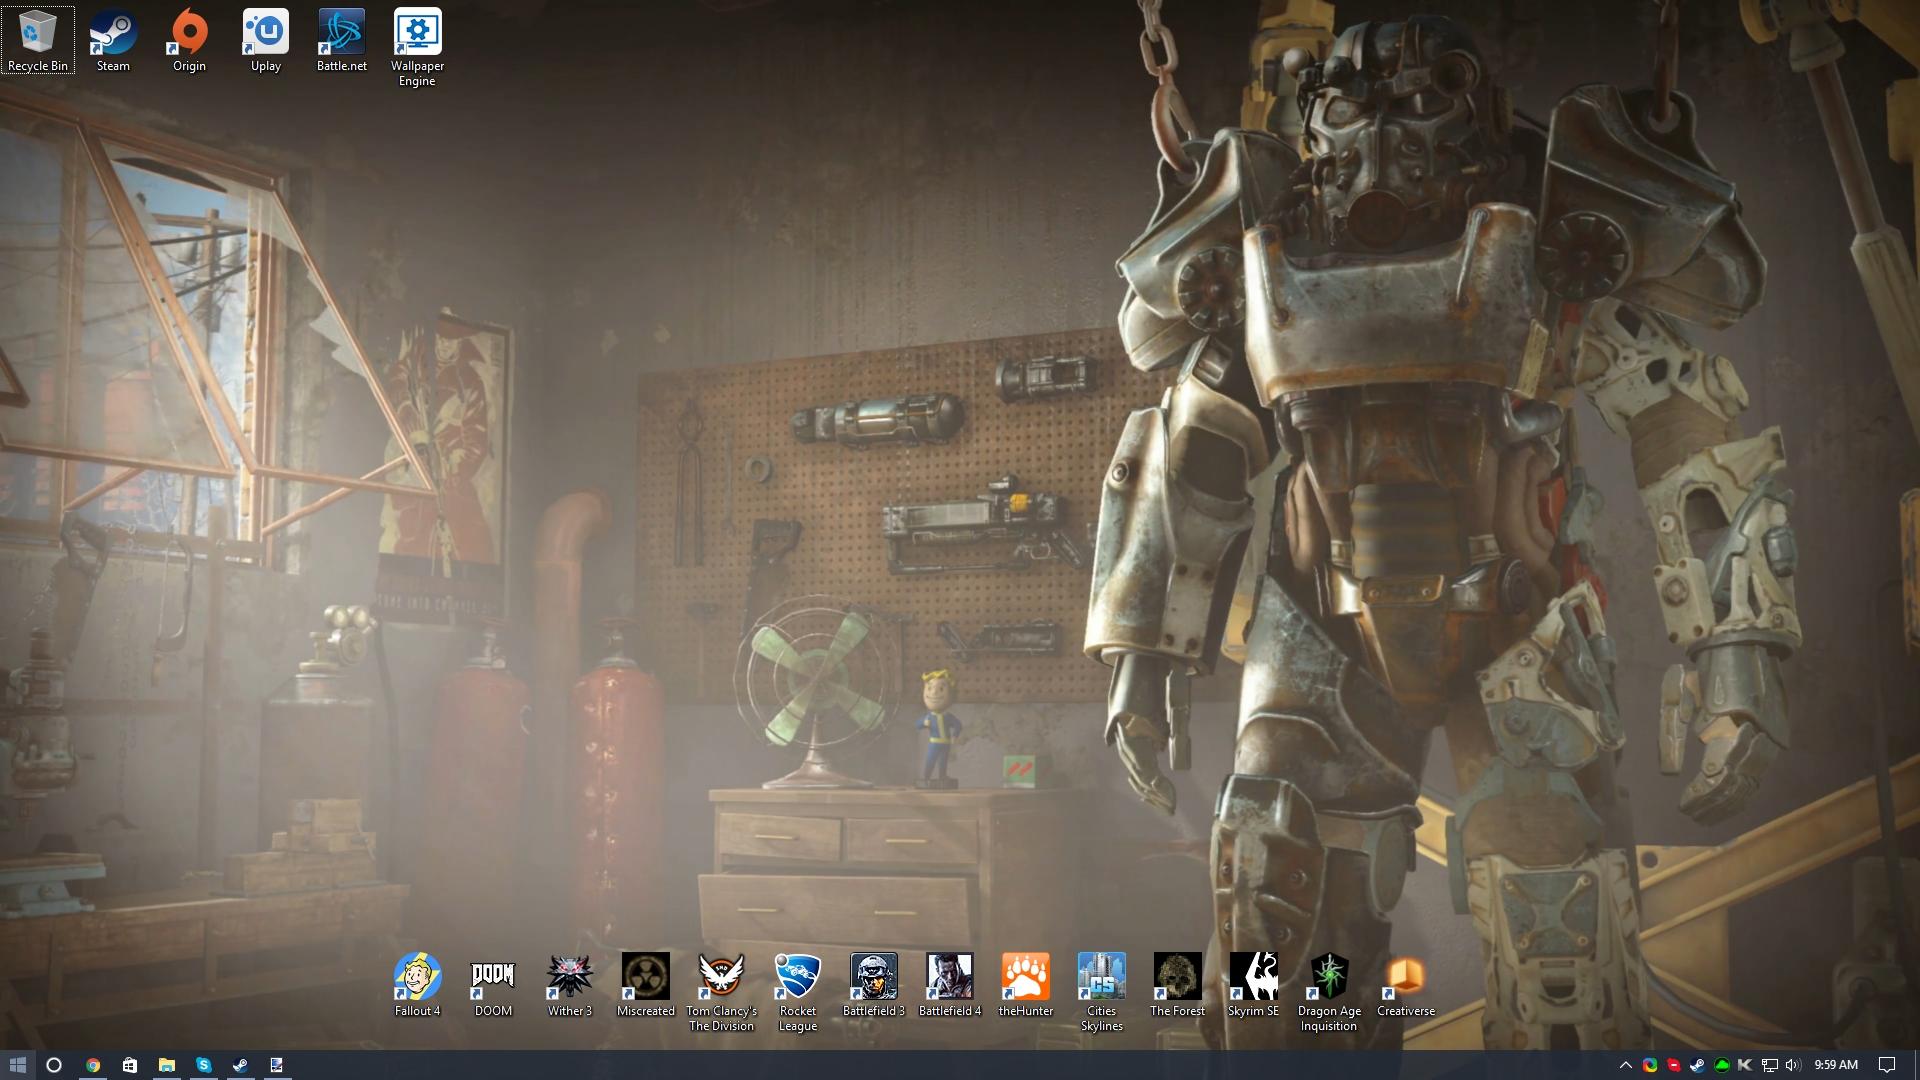 Steam Workshop Fallout 4 Main Menu 4k With Sound